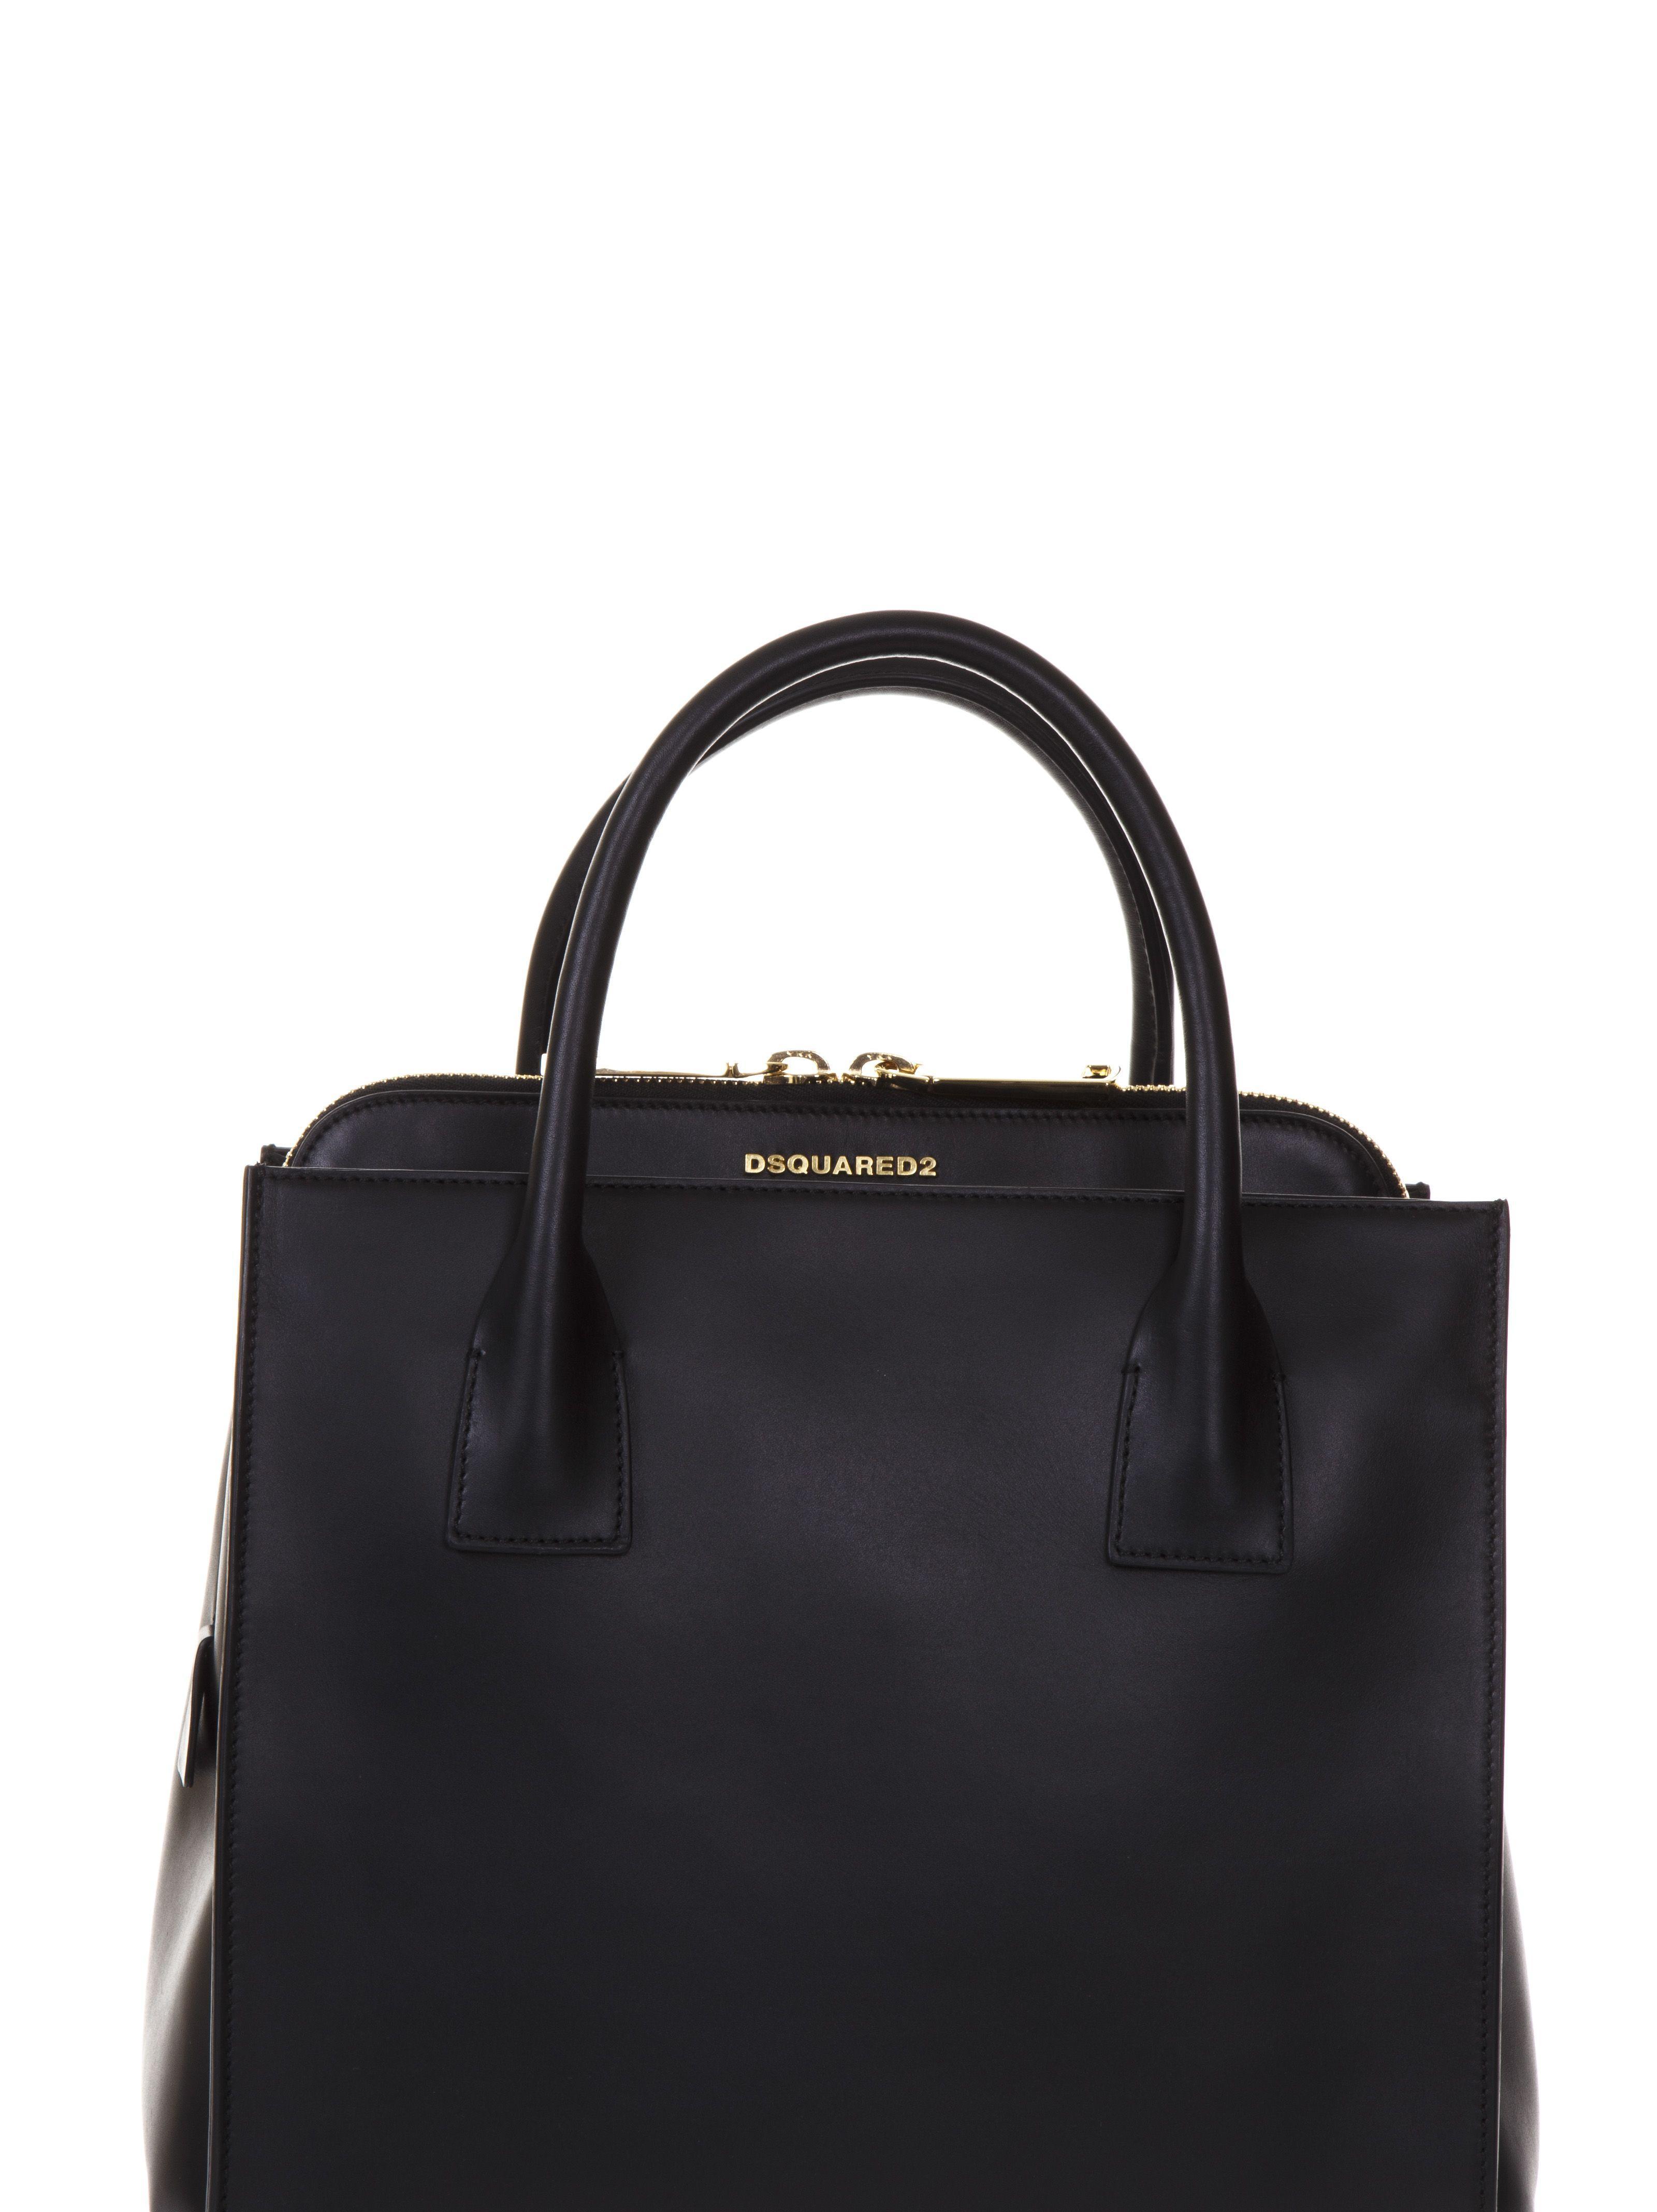 Dsquared2 Leather Deana Handbag In Black